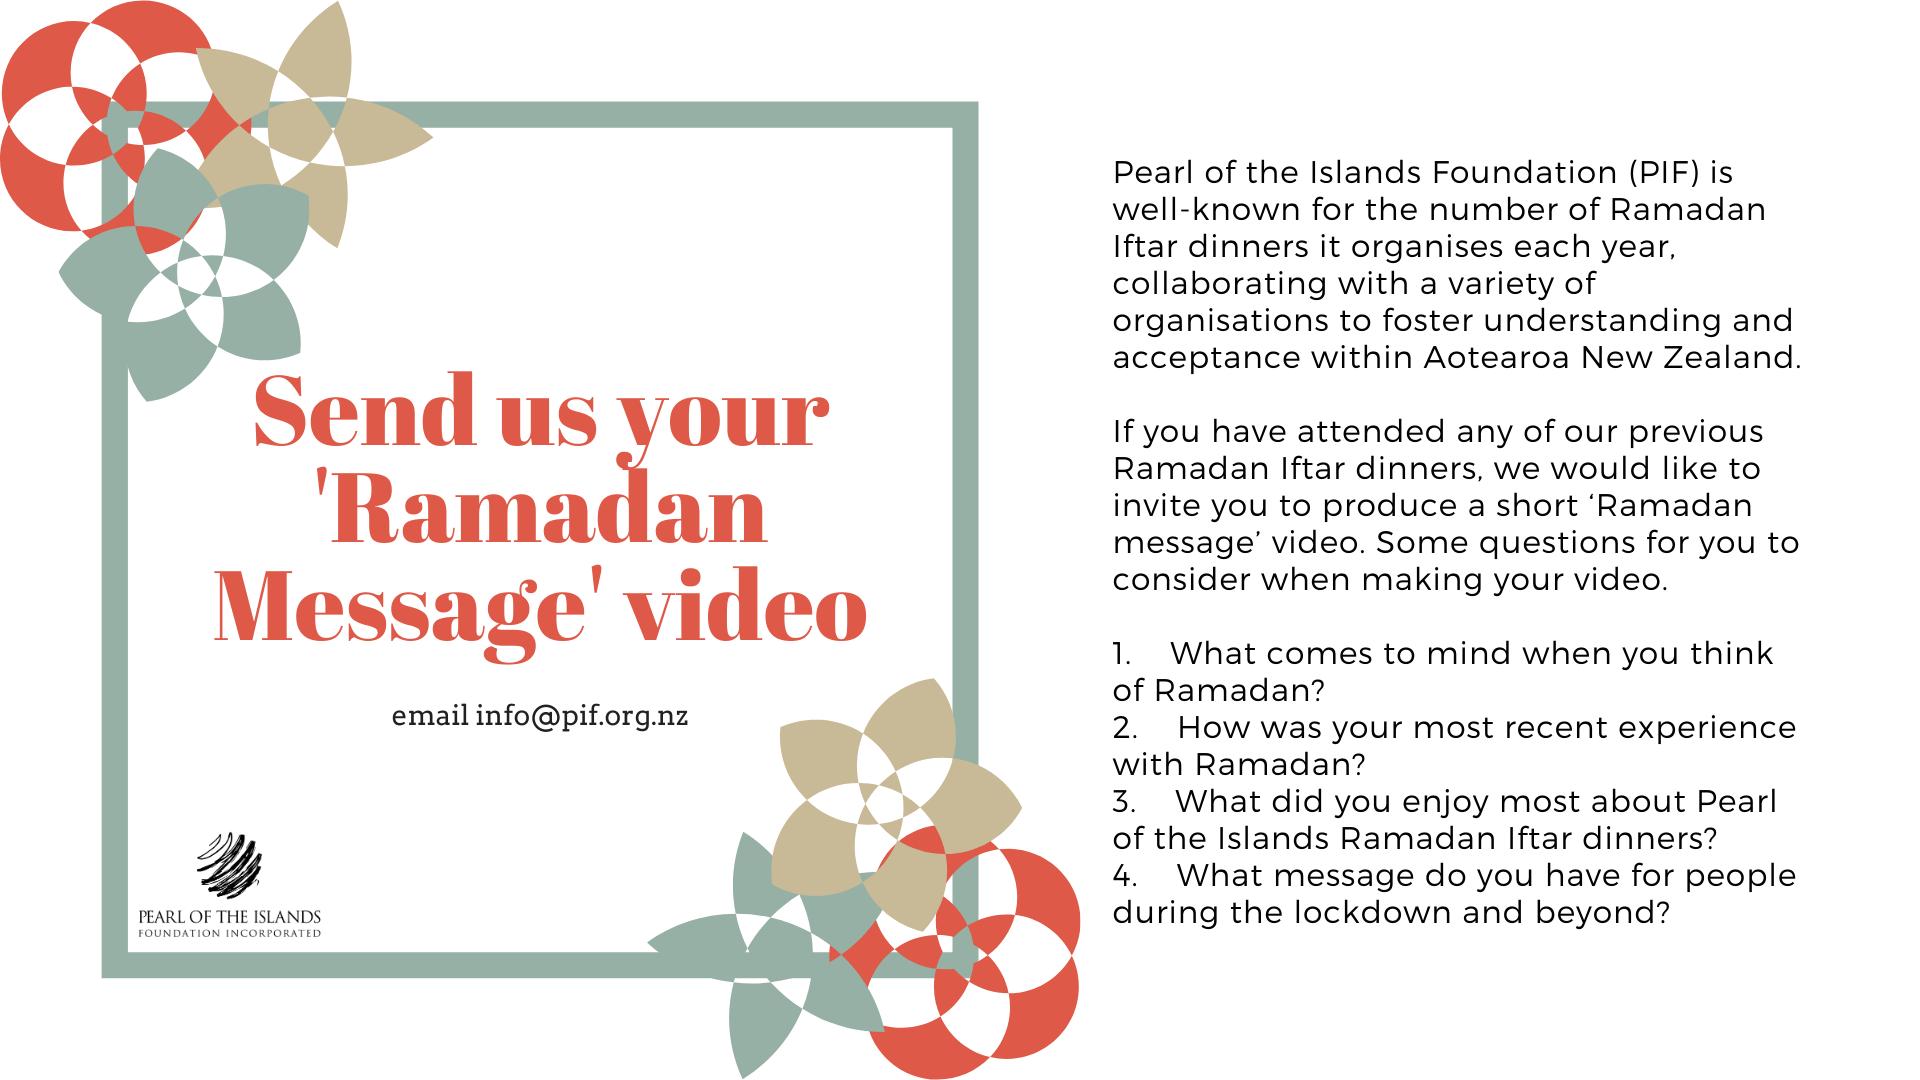 #PIFRamadanMessages